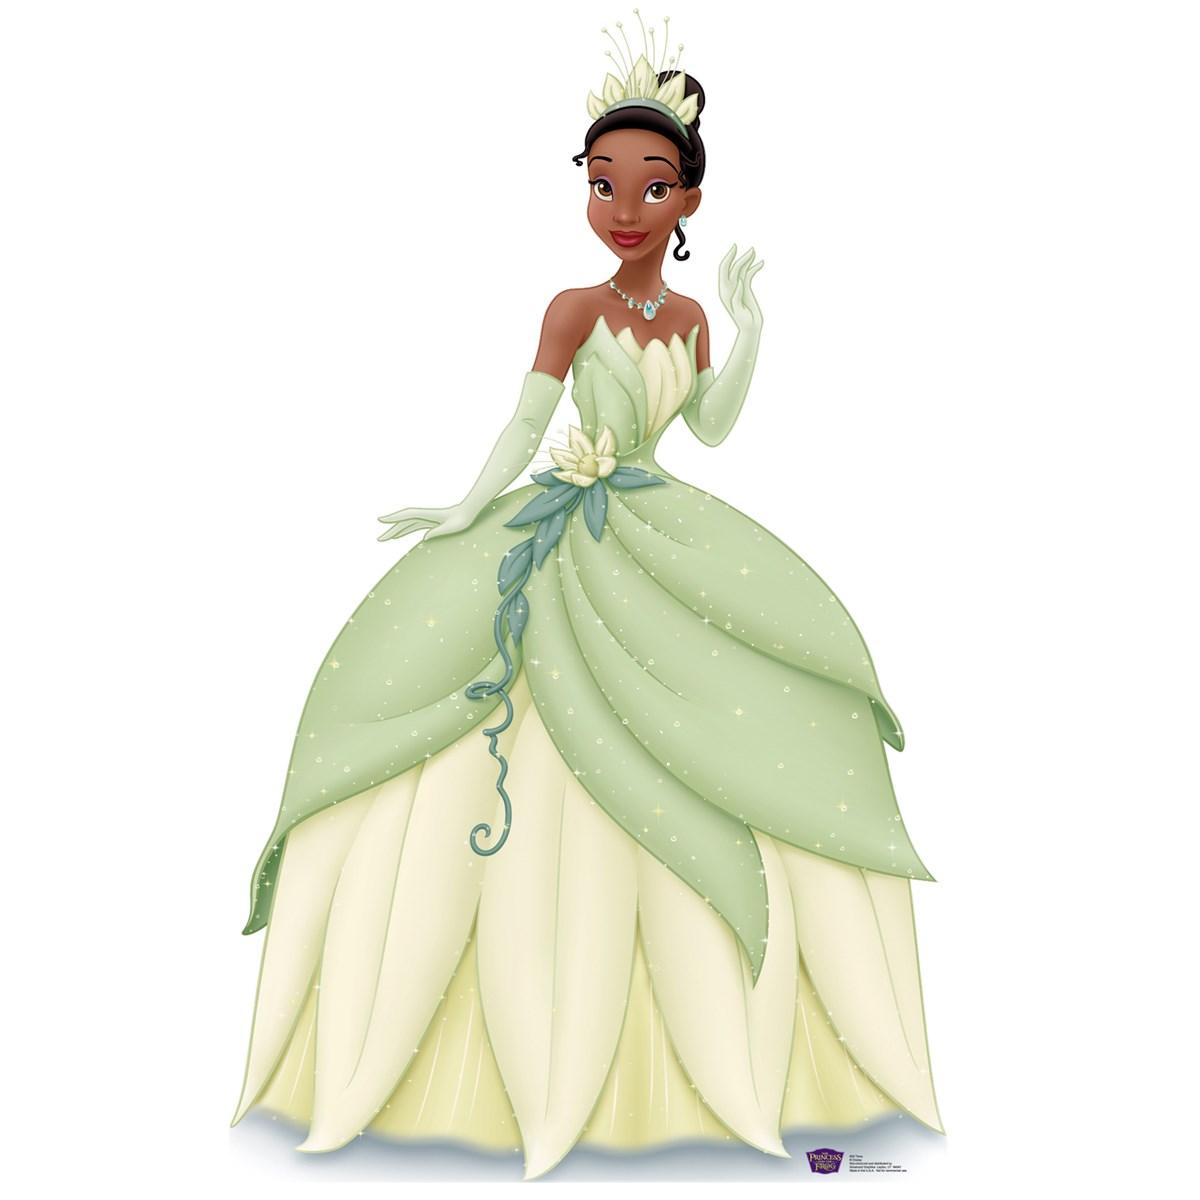 Princesa Cadance | My Little Pony: La Magia de la Amistad